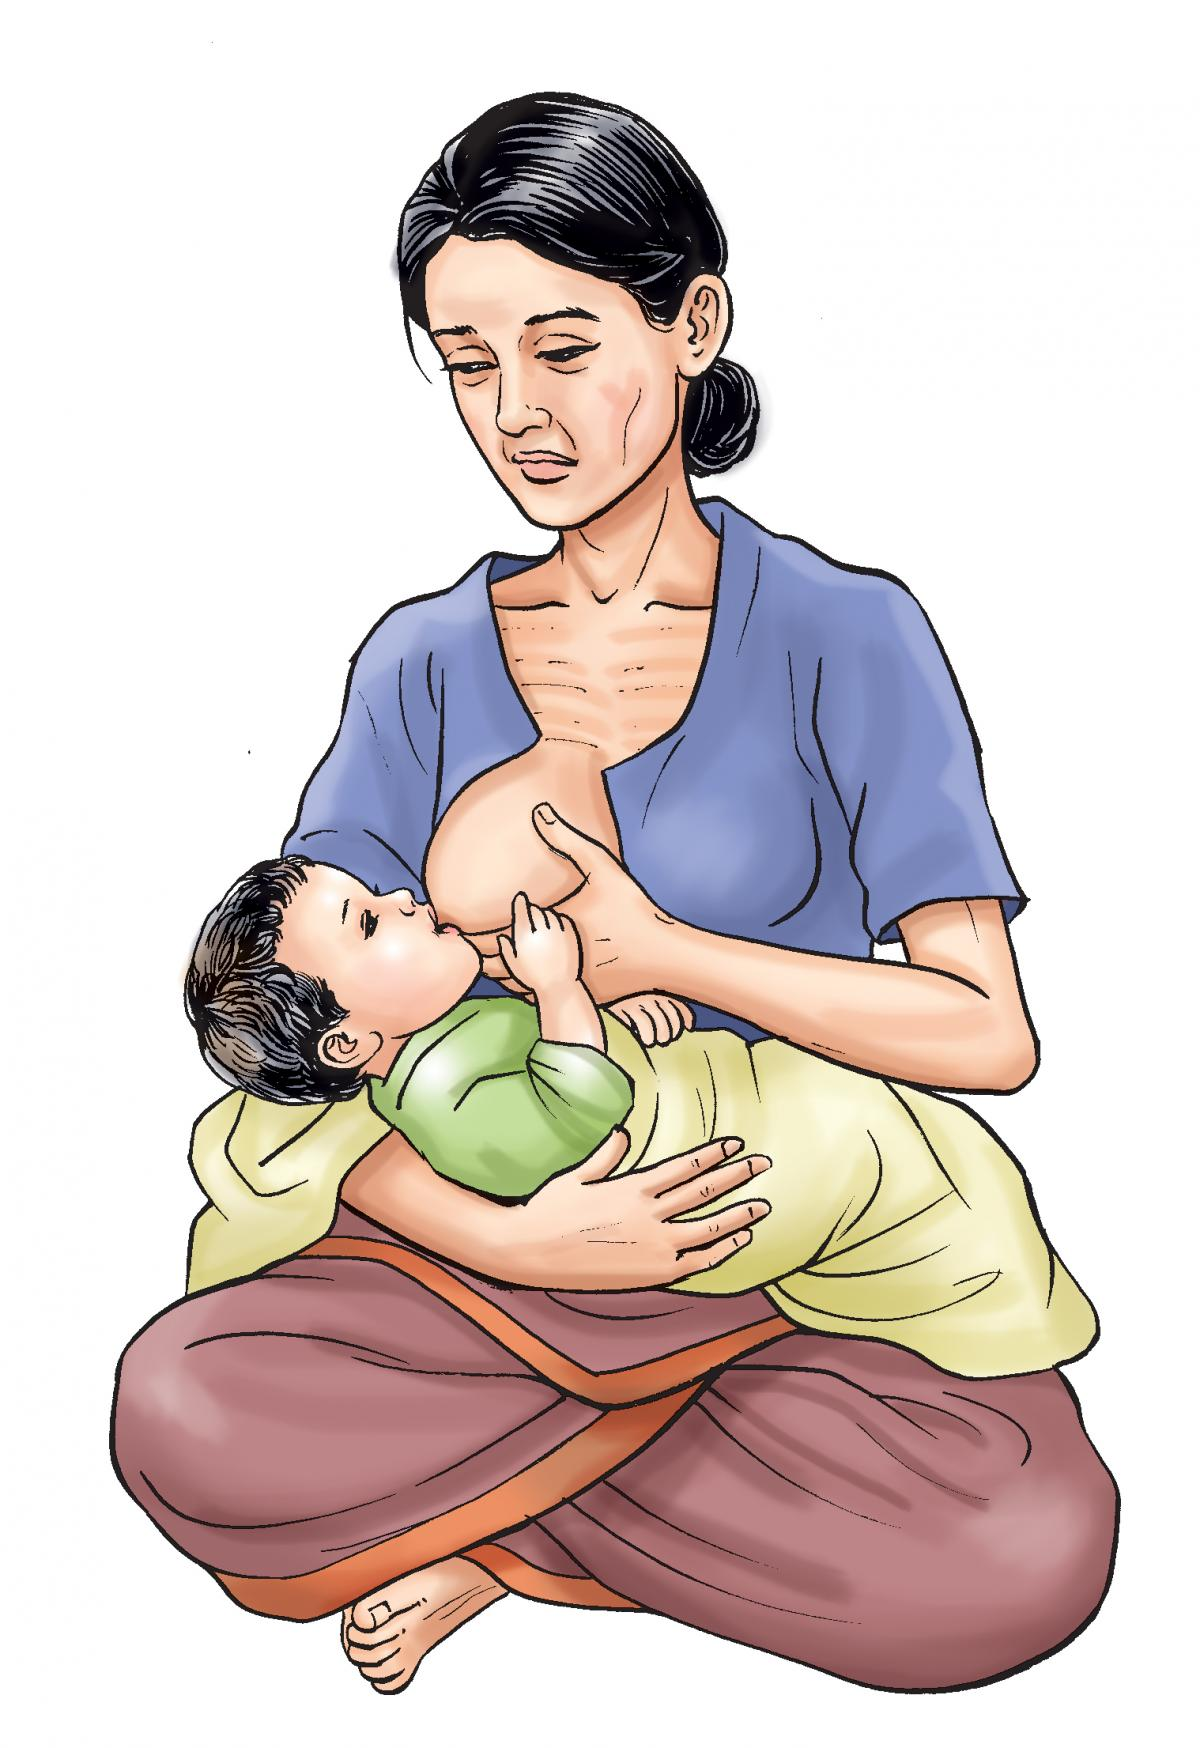 Breastfeeding - Malnourished mother breastfeeding - 01 - Nepal